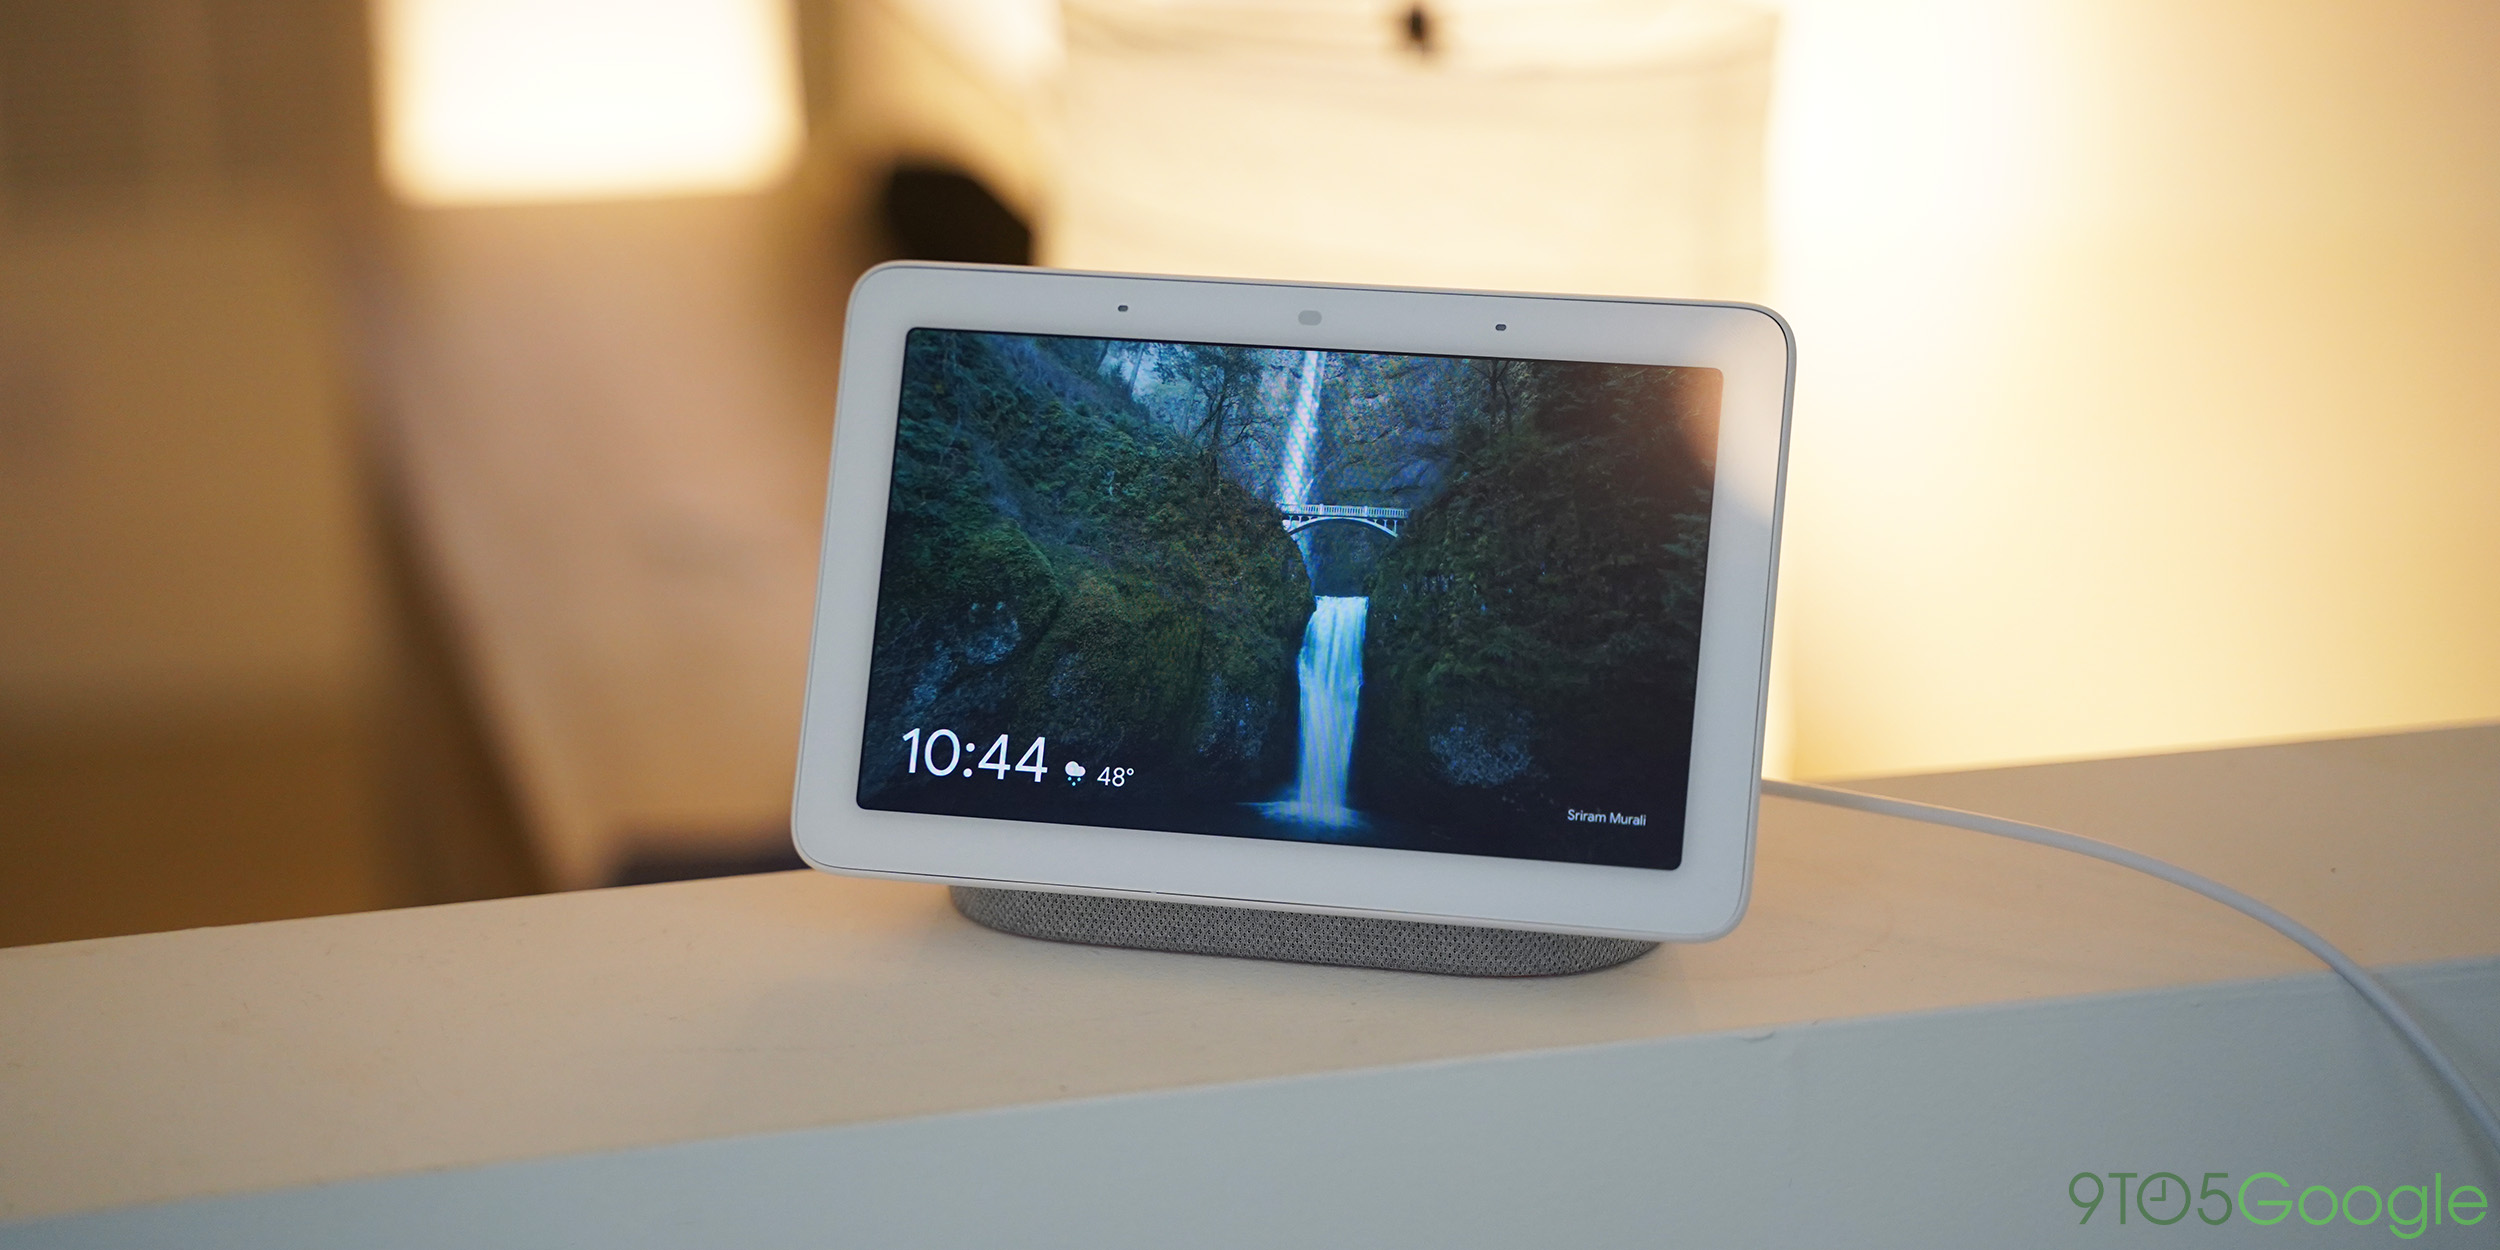 9to5Toys Last Call: Lenovo Smart Display from $100, Roku